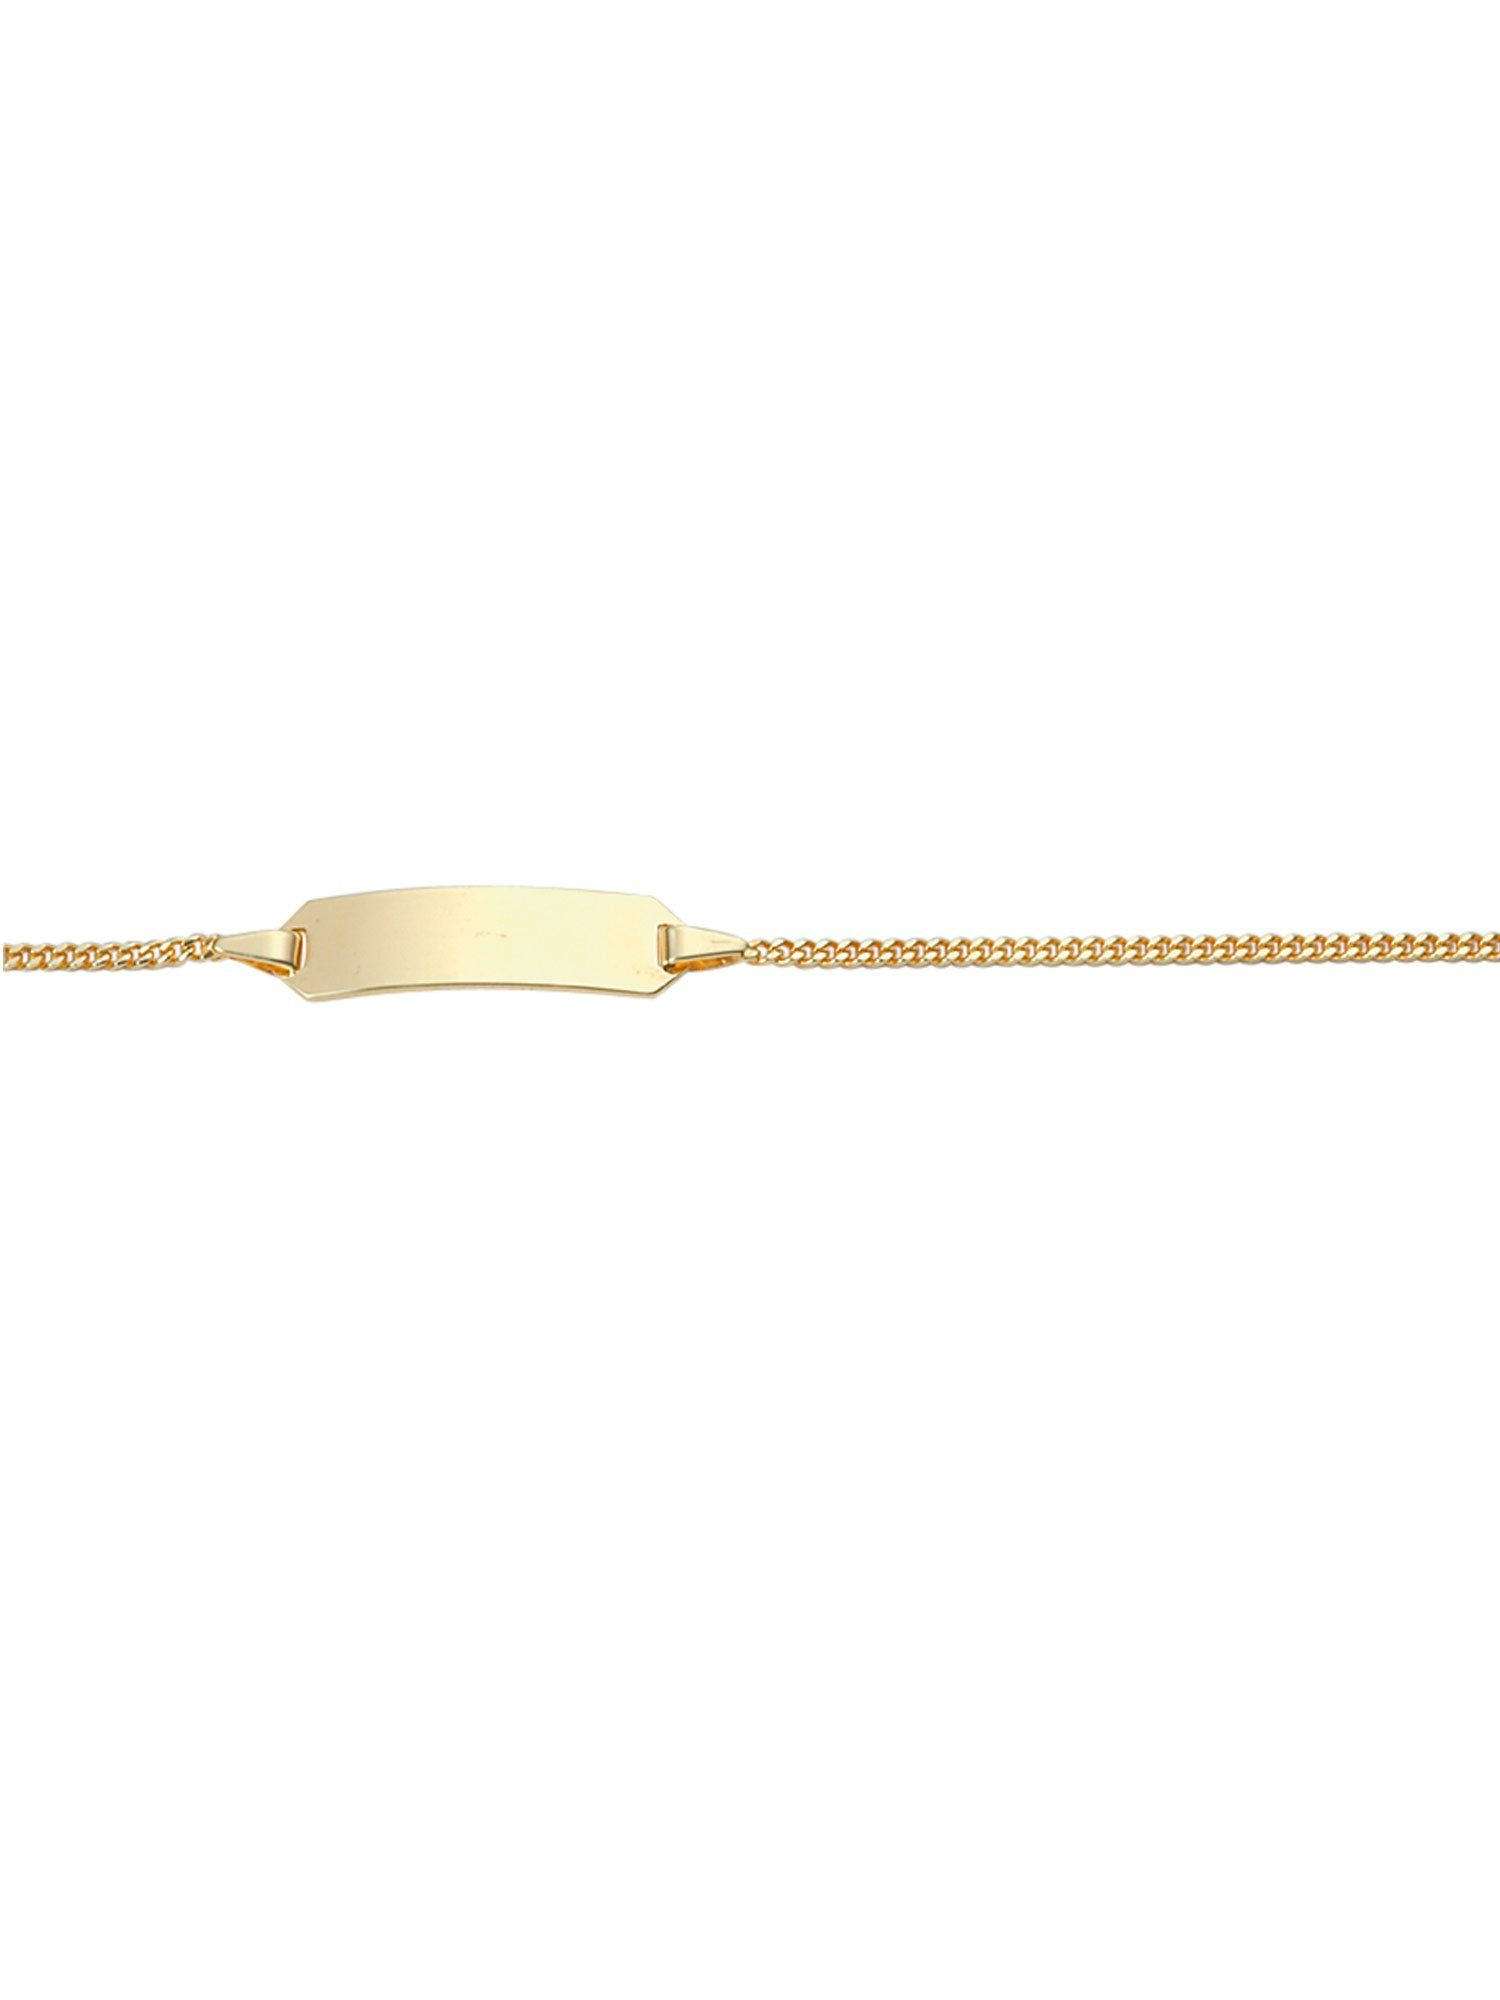 Adelia´s Goldarmband »Gold Armbänder« 14 k 585 Gelbgold Flach Panzerkette